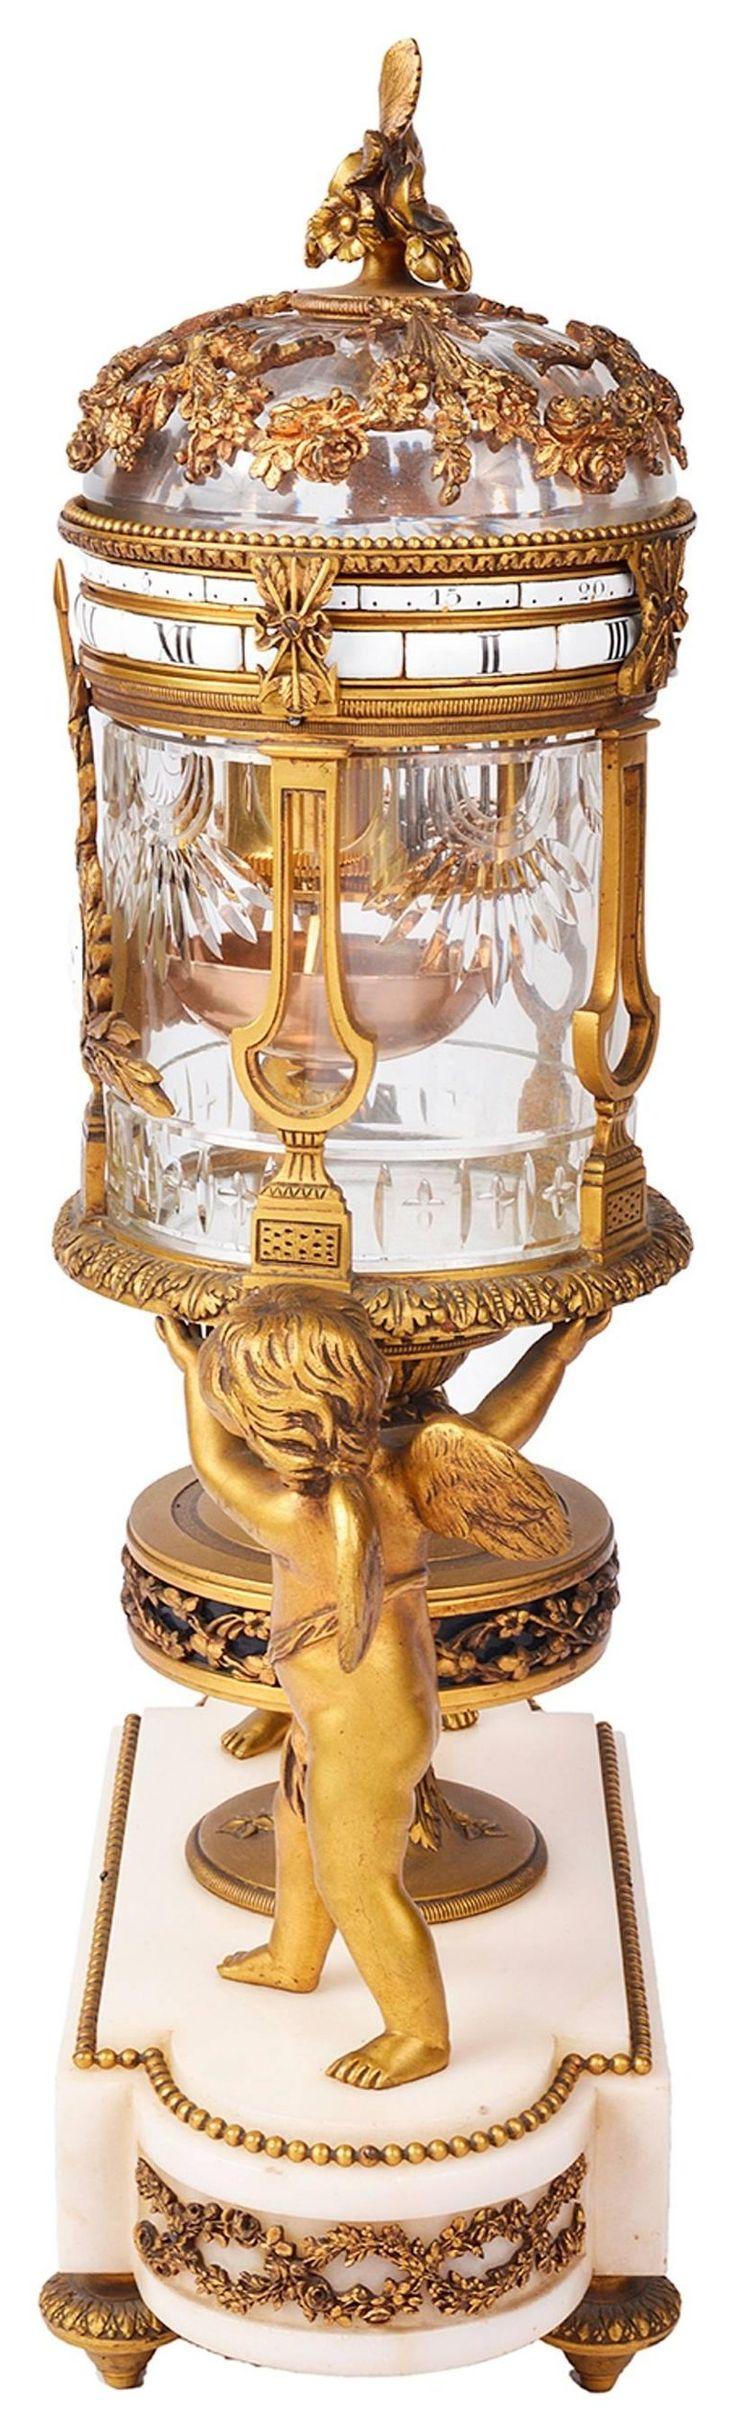 19th Century Revolving Mantel Clock 4